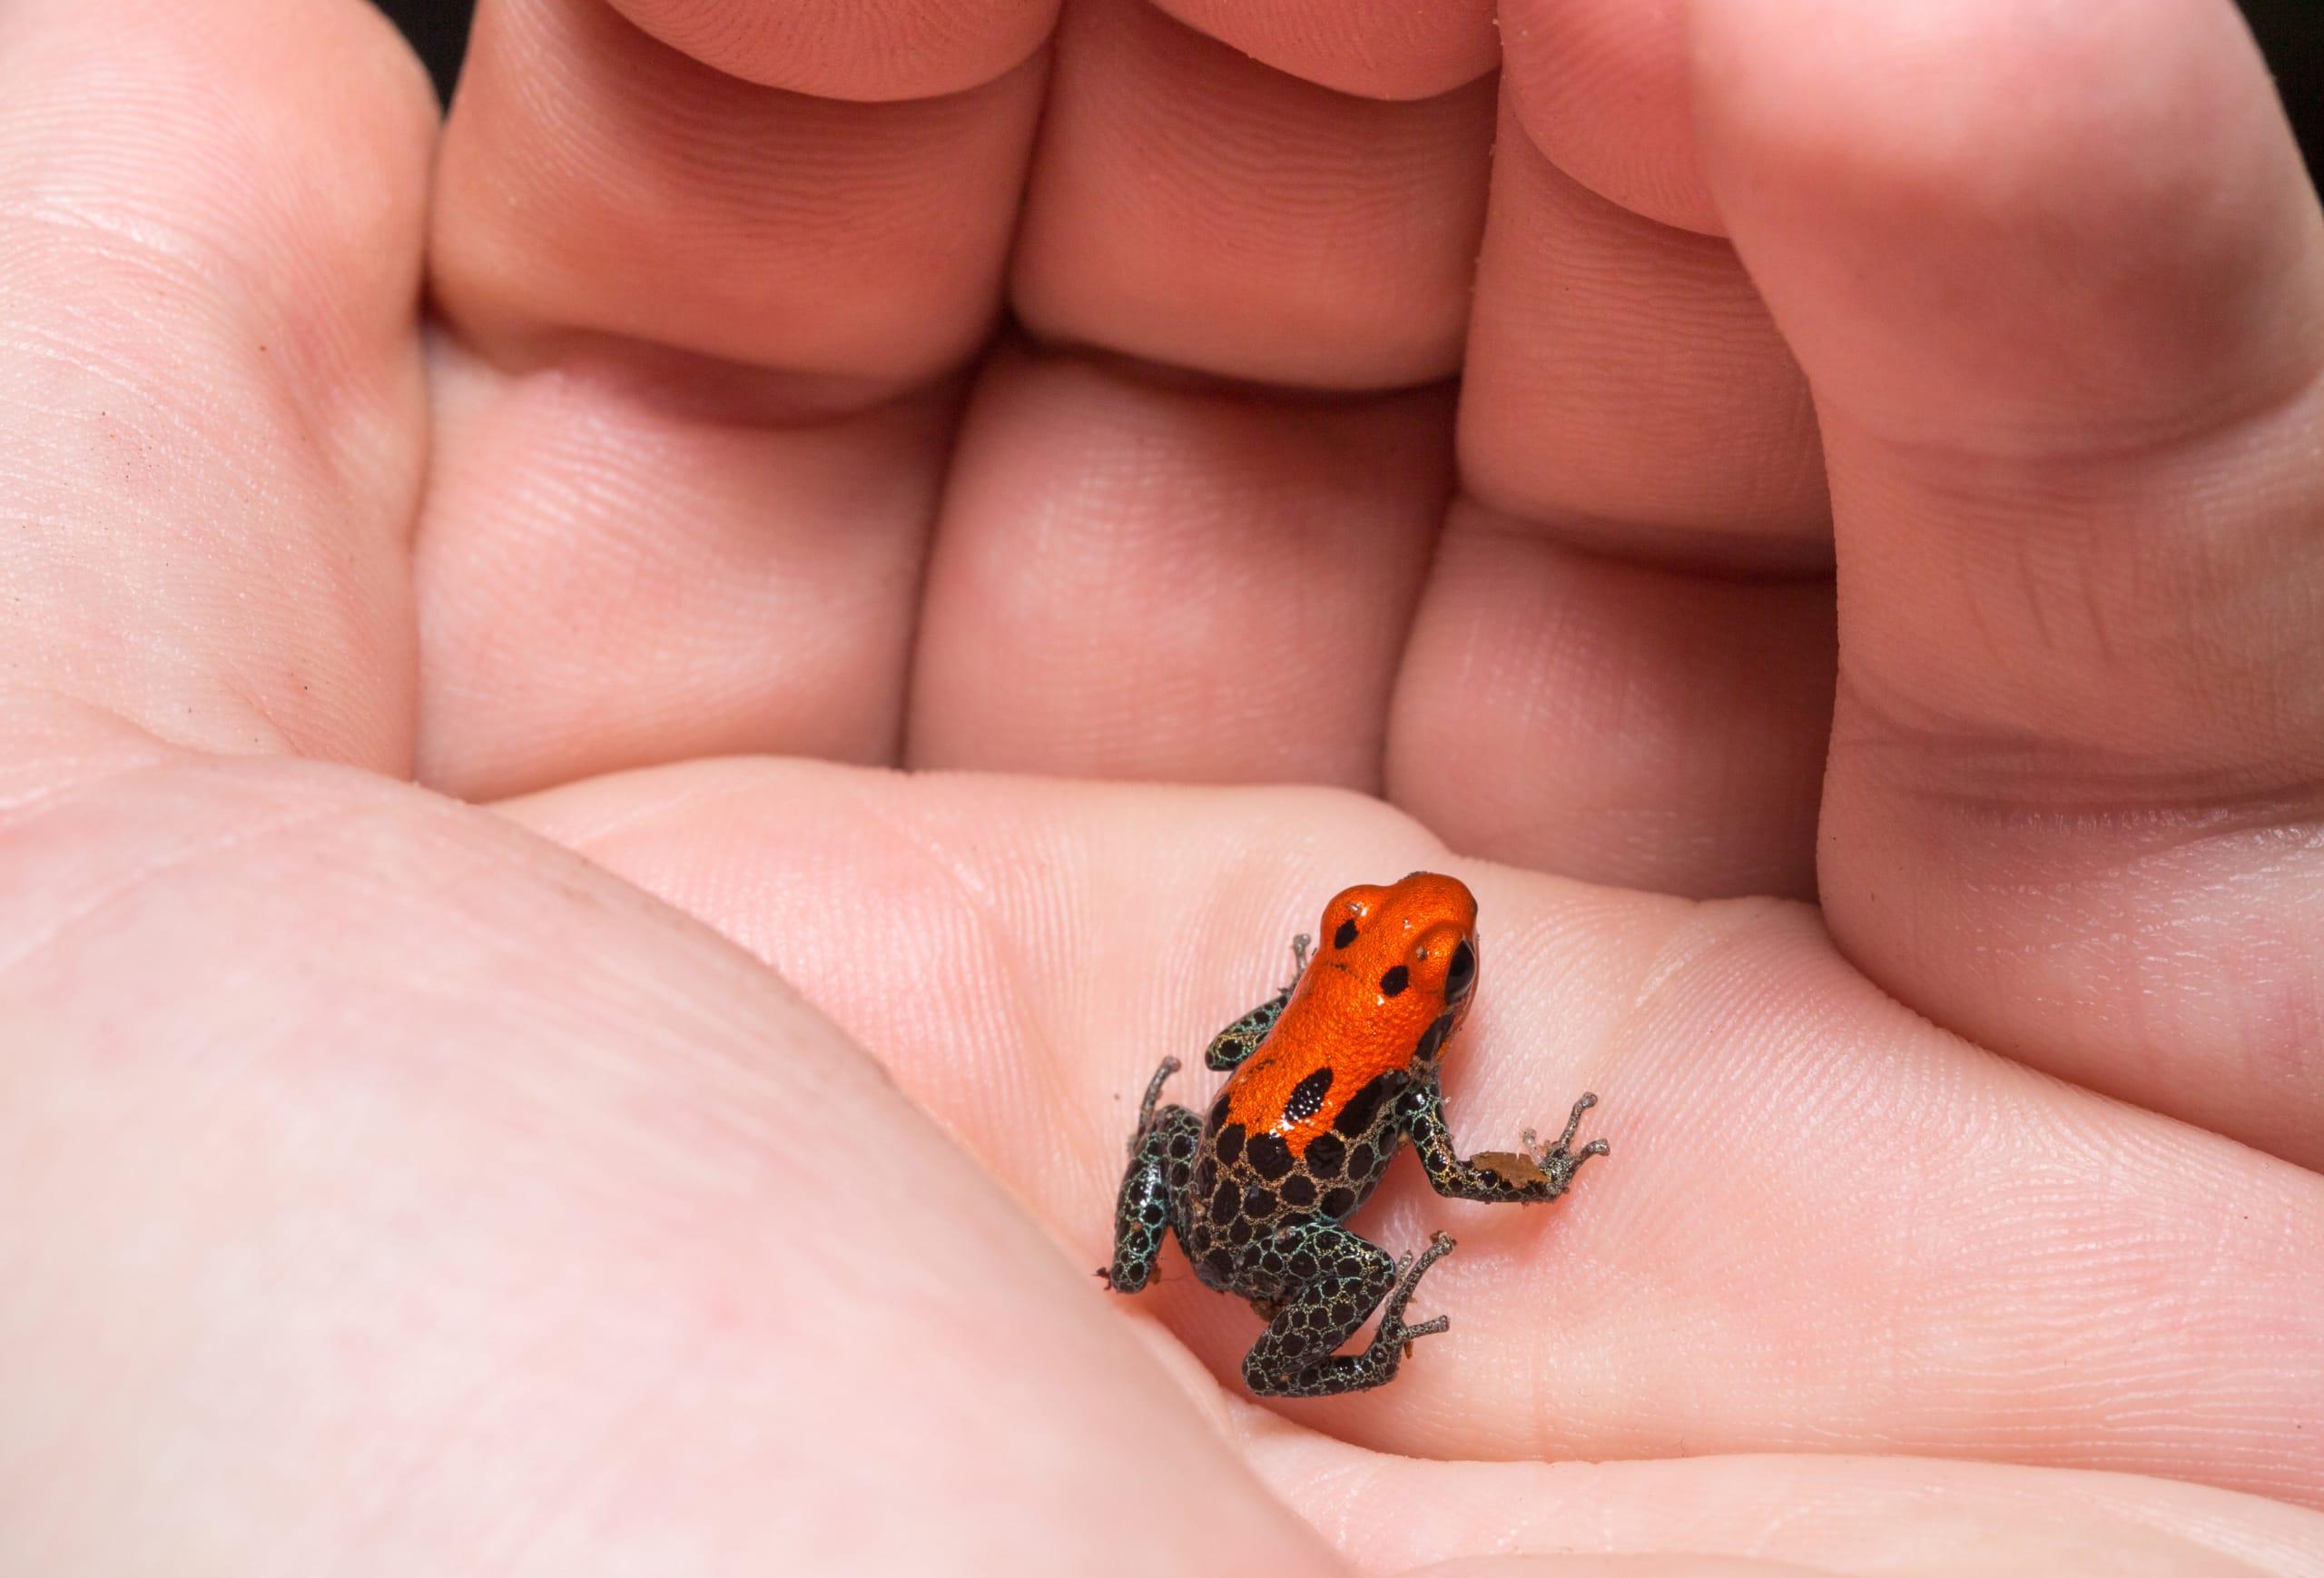 Redbacked Poison Frog Ranitomeya Reticulata